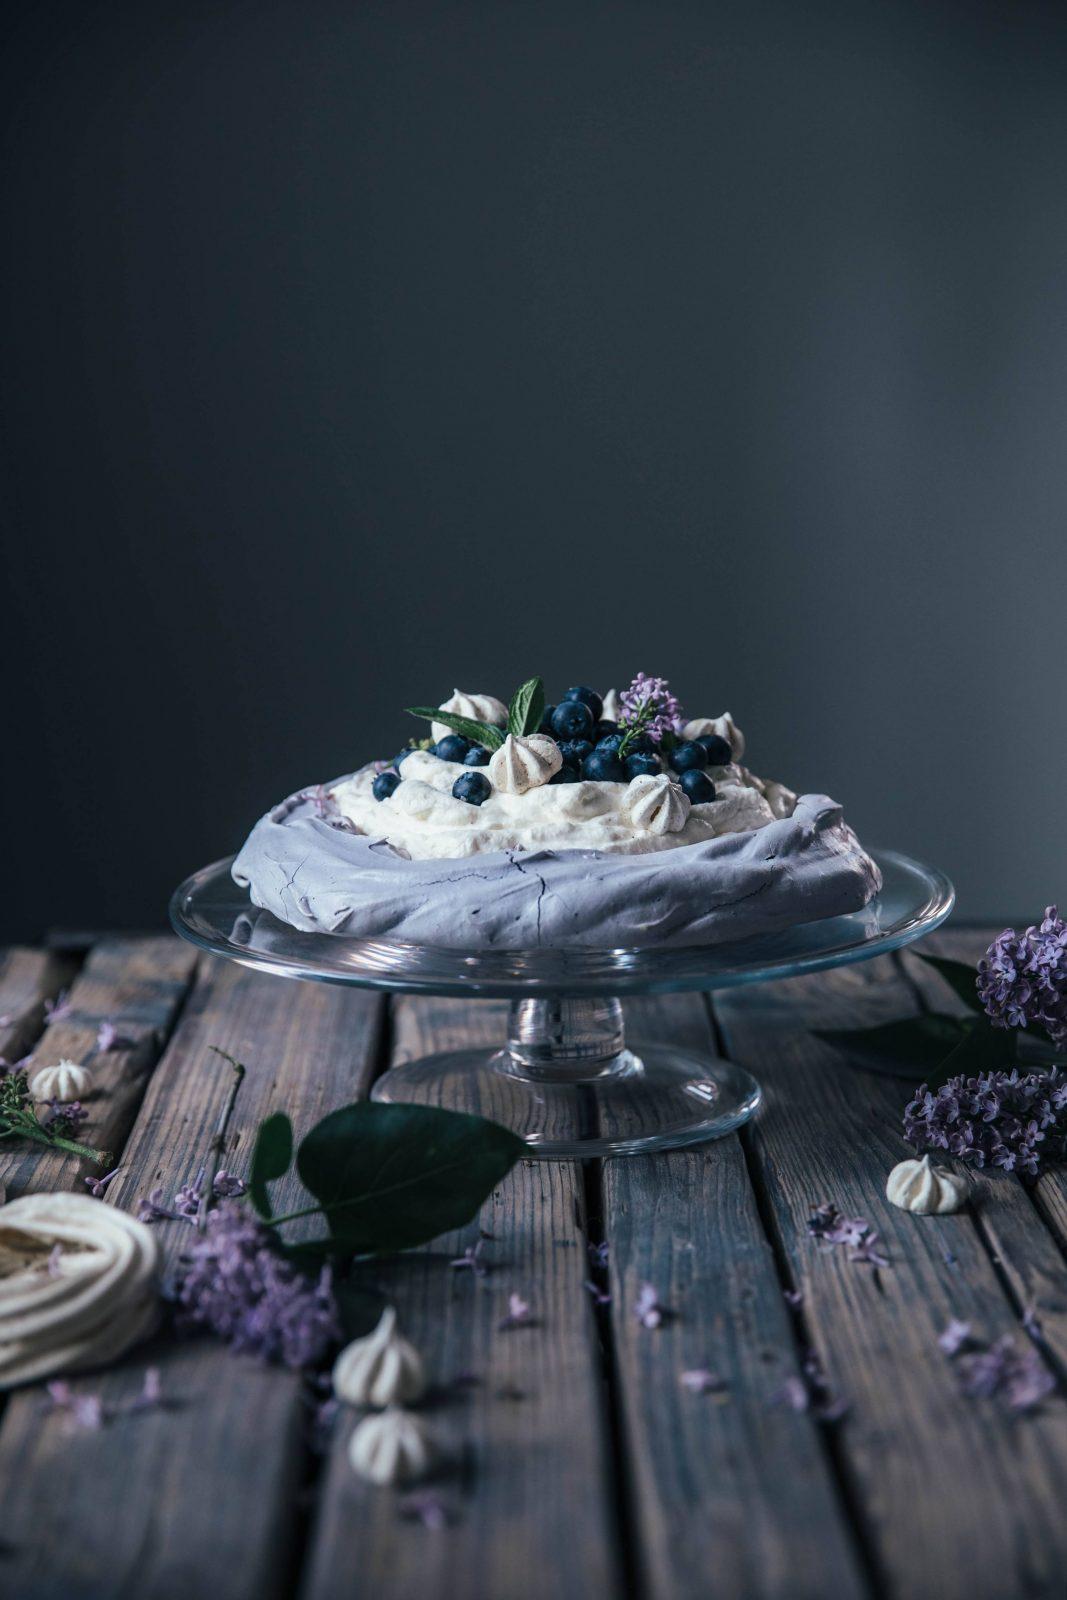 Gluten-free Blueberry Pavlova & Blueberry Banana Ice-Cream